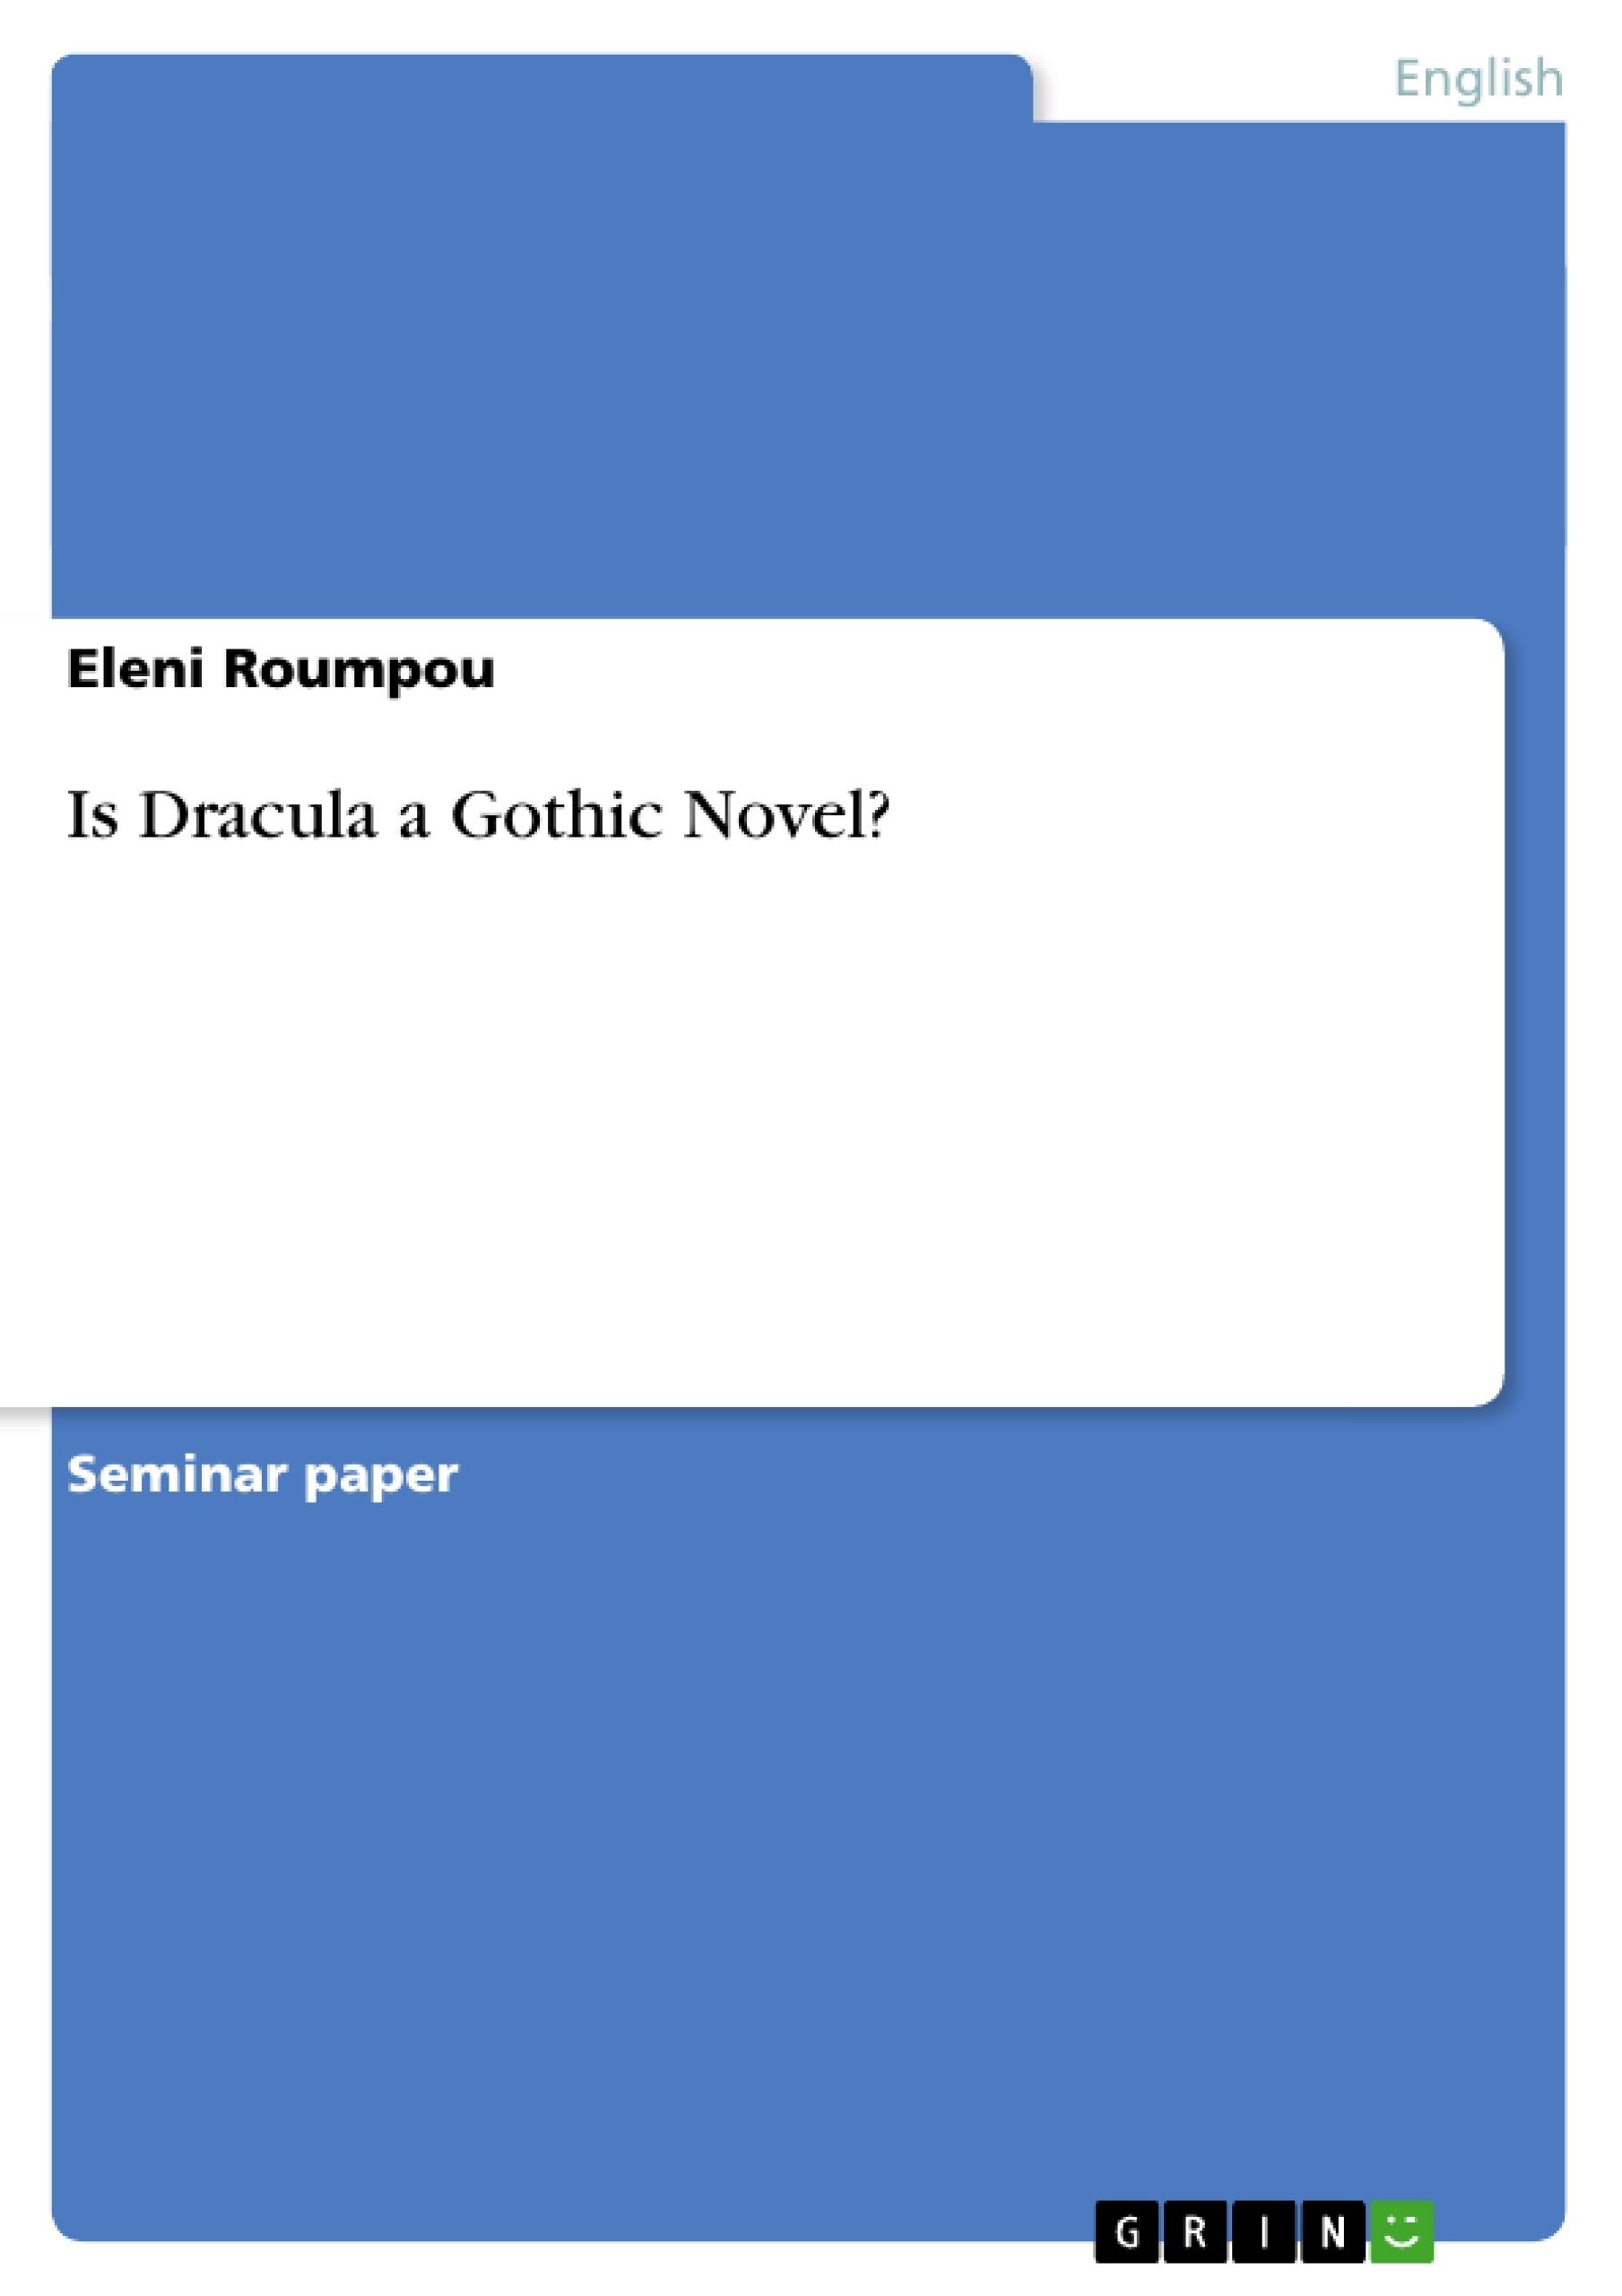 Title: Is Dracula a Gothic Novel?